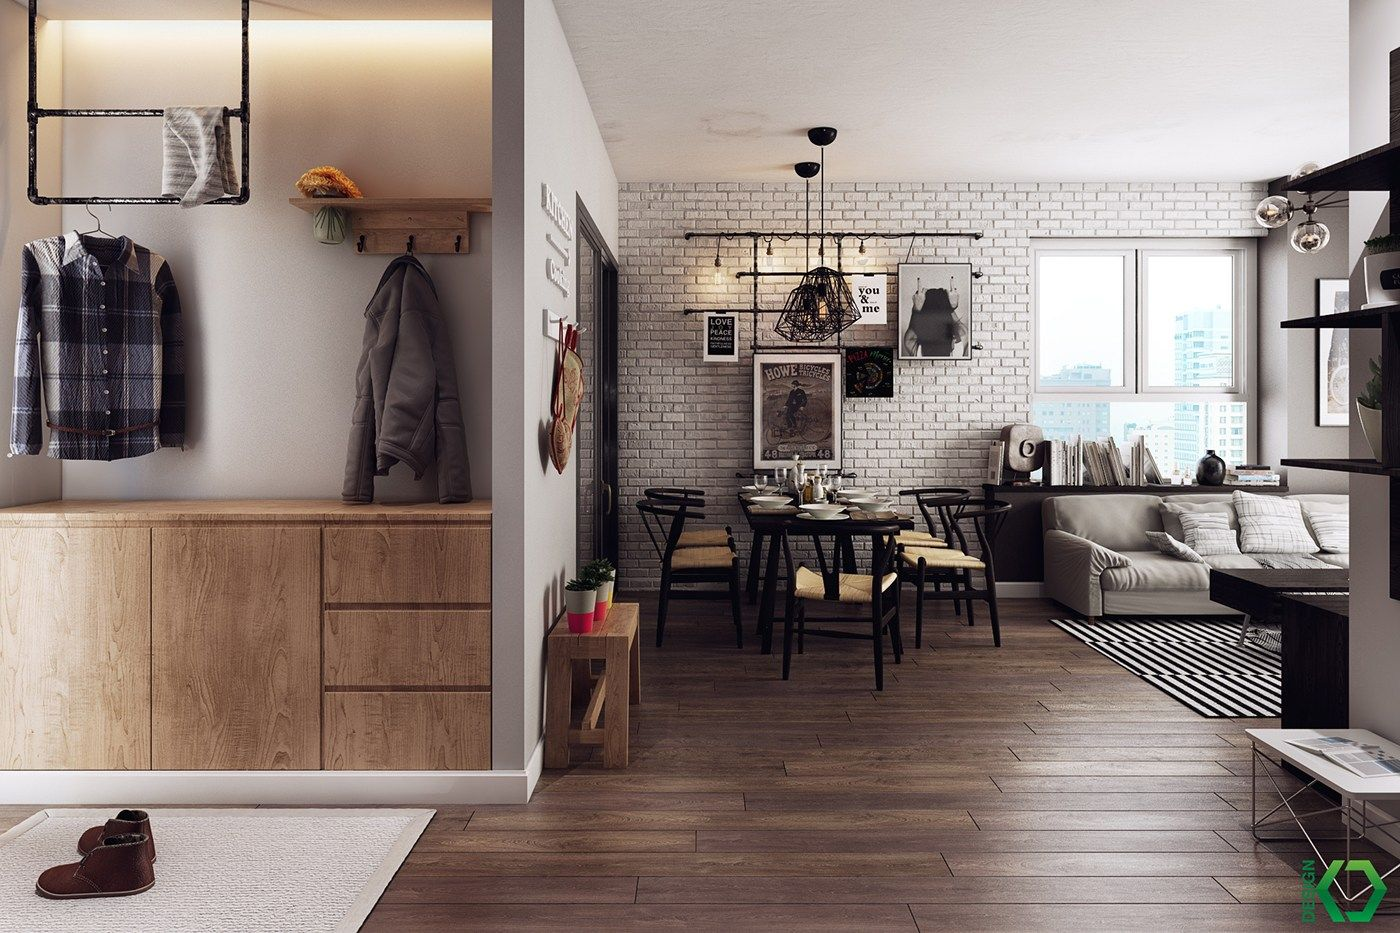 A Charming Nordic Apartment Interior Design by Koj Design | Nordic ...